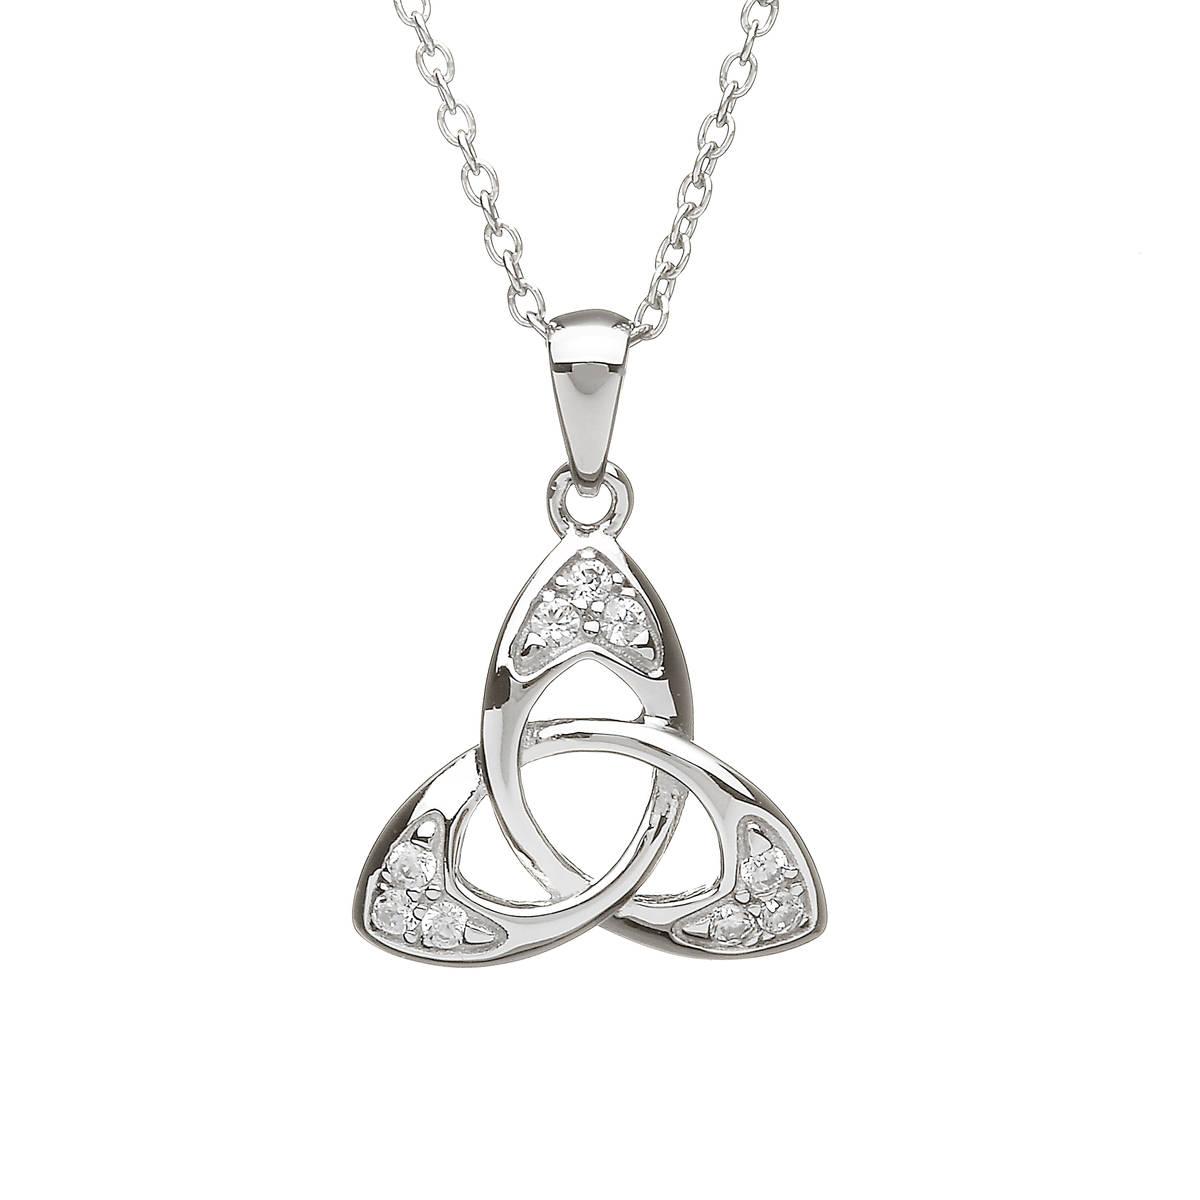 Silver Cubic Zirconia Trinity Pendant